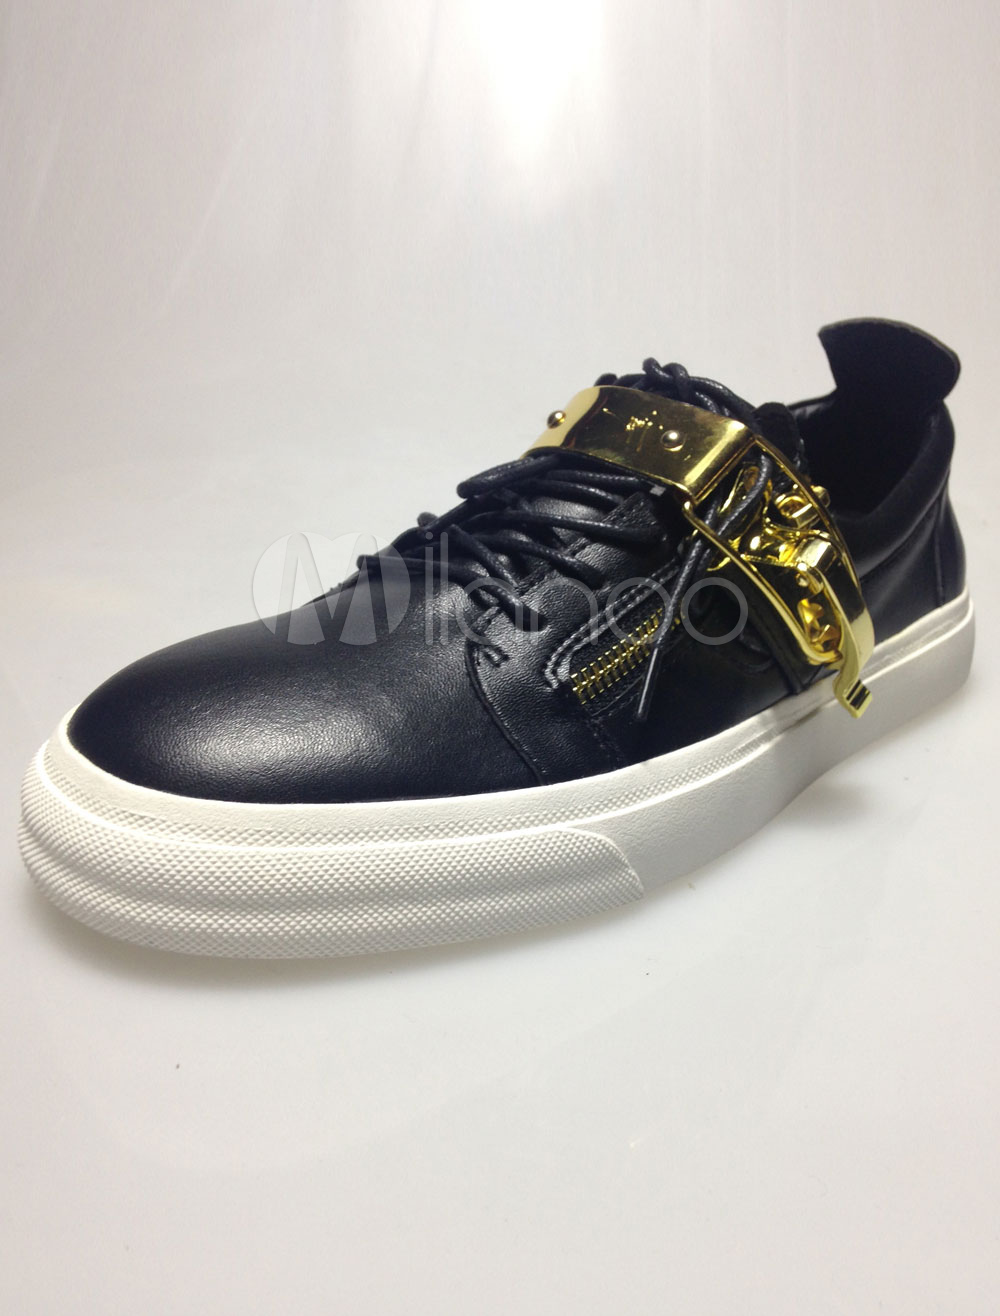 Black Zipper Leather Sneakers for Men thumbnail